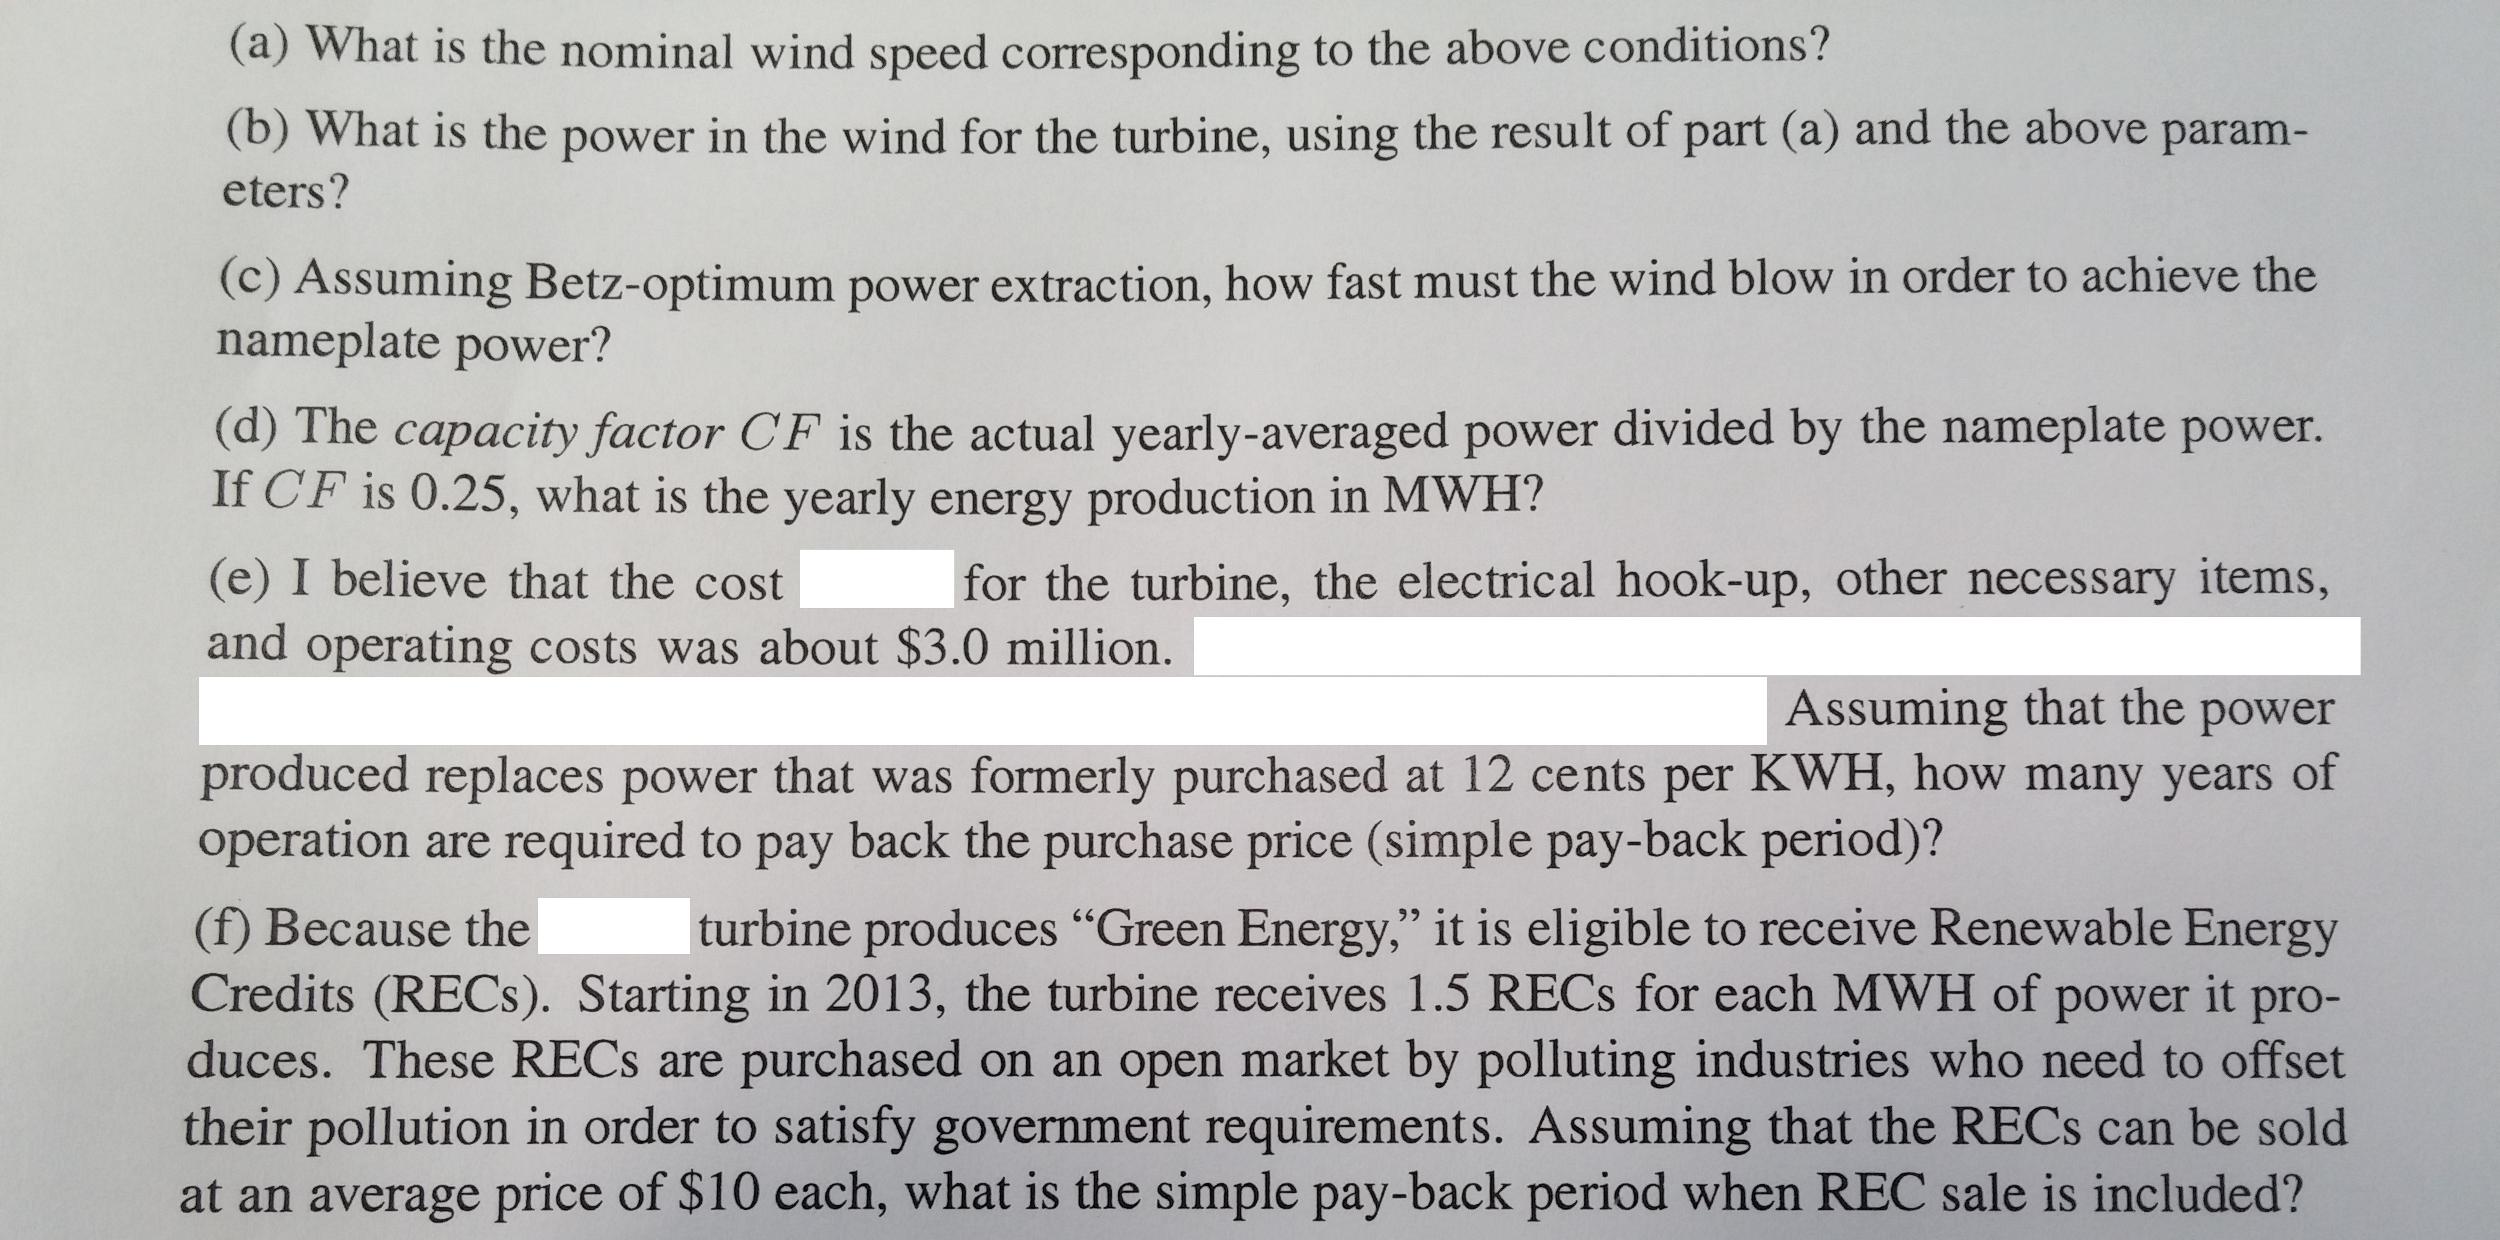 Economic Value A Turbine The Nominal Parameter